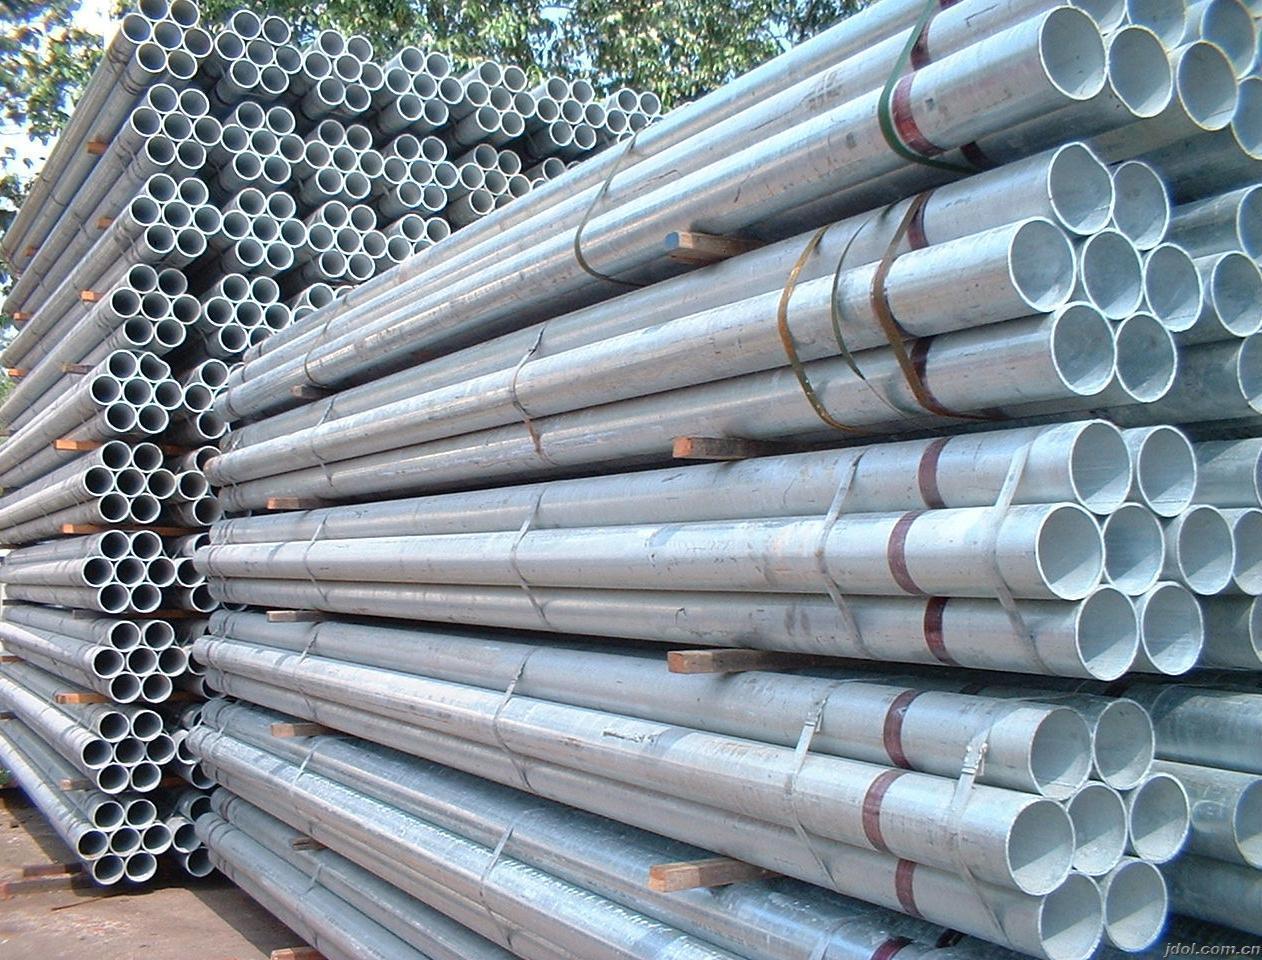 China Steel Galvanized Pipe Galvanized Iron Pipe Price